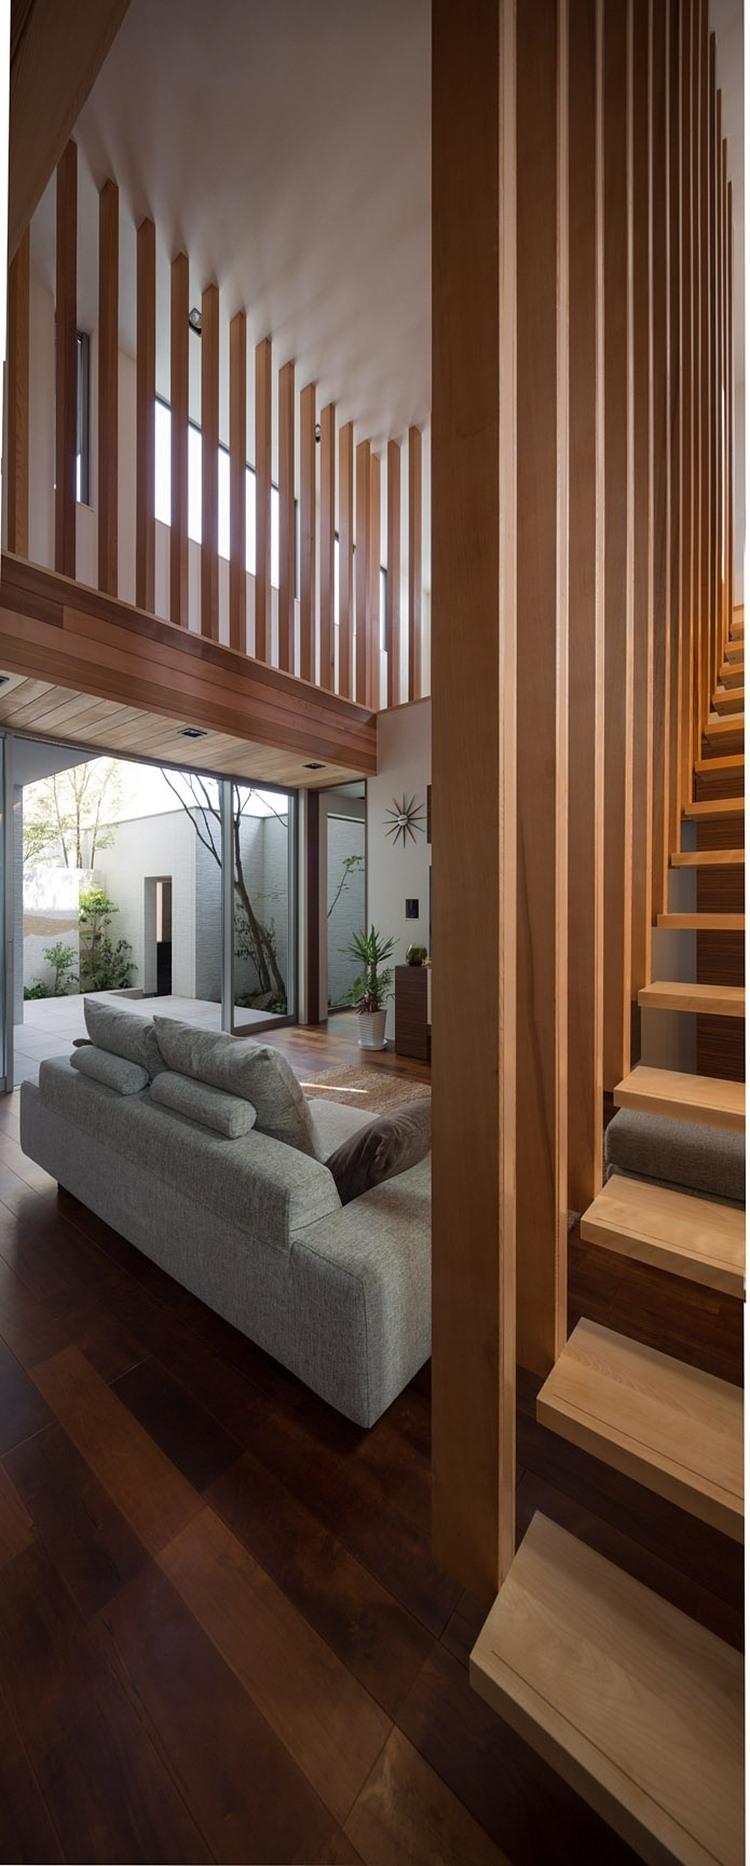 2-stories-modern-house (9)